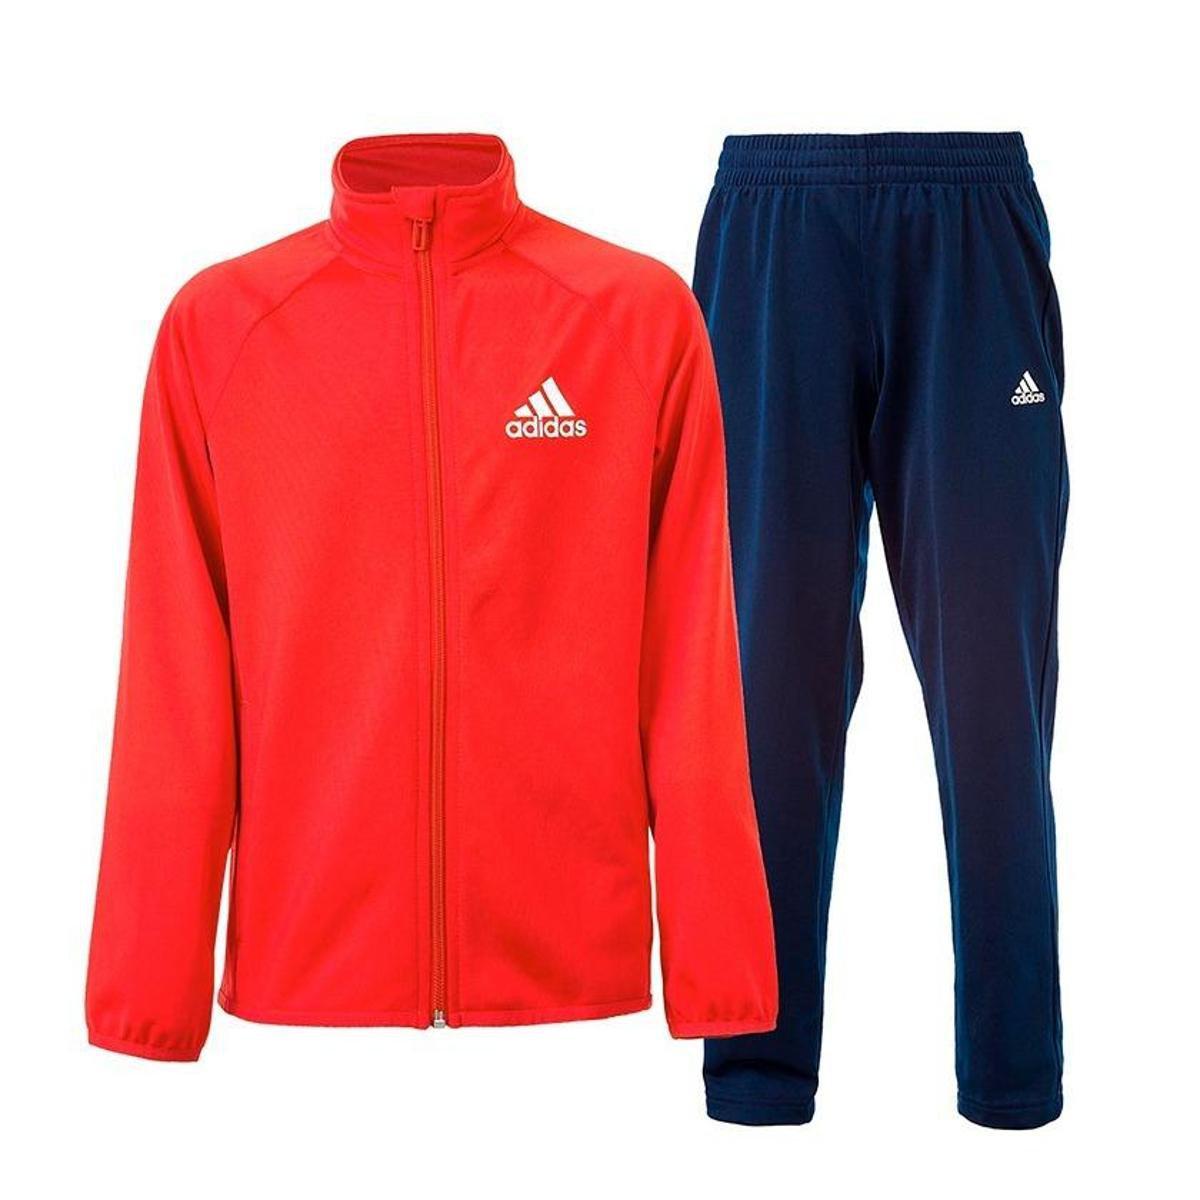 4646266058 Agasalho Infantil Adidas Yb Entry Oh Masculino - Compre Agora